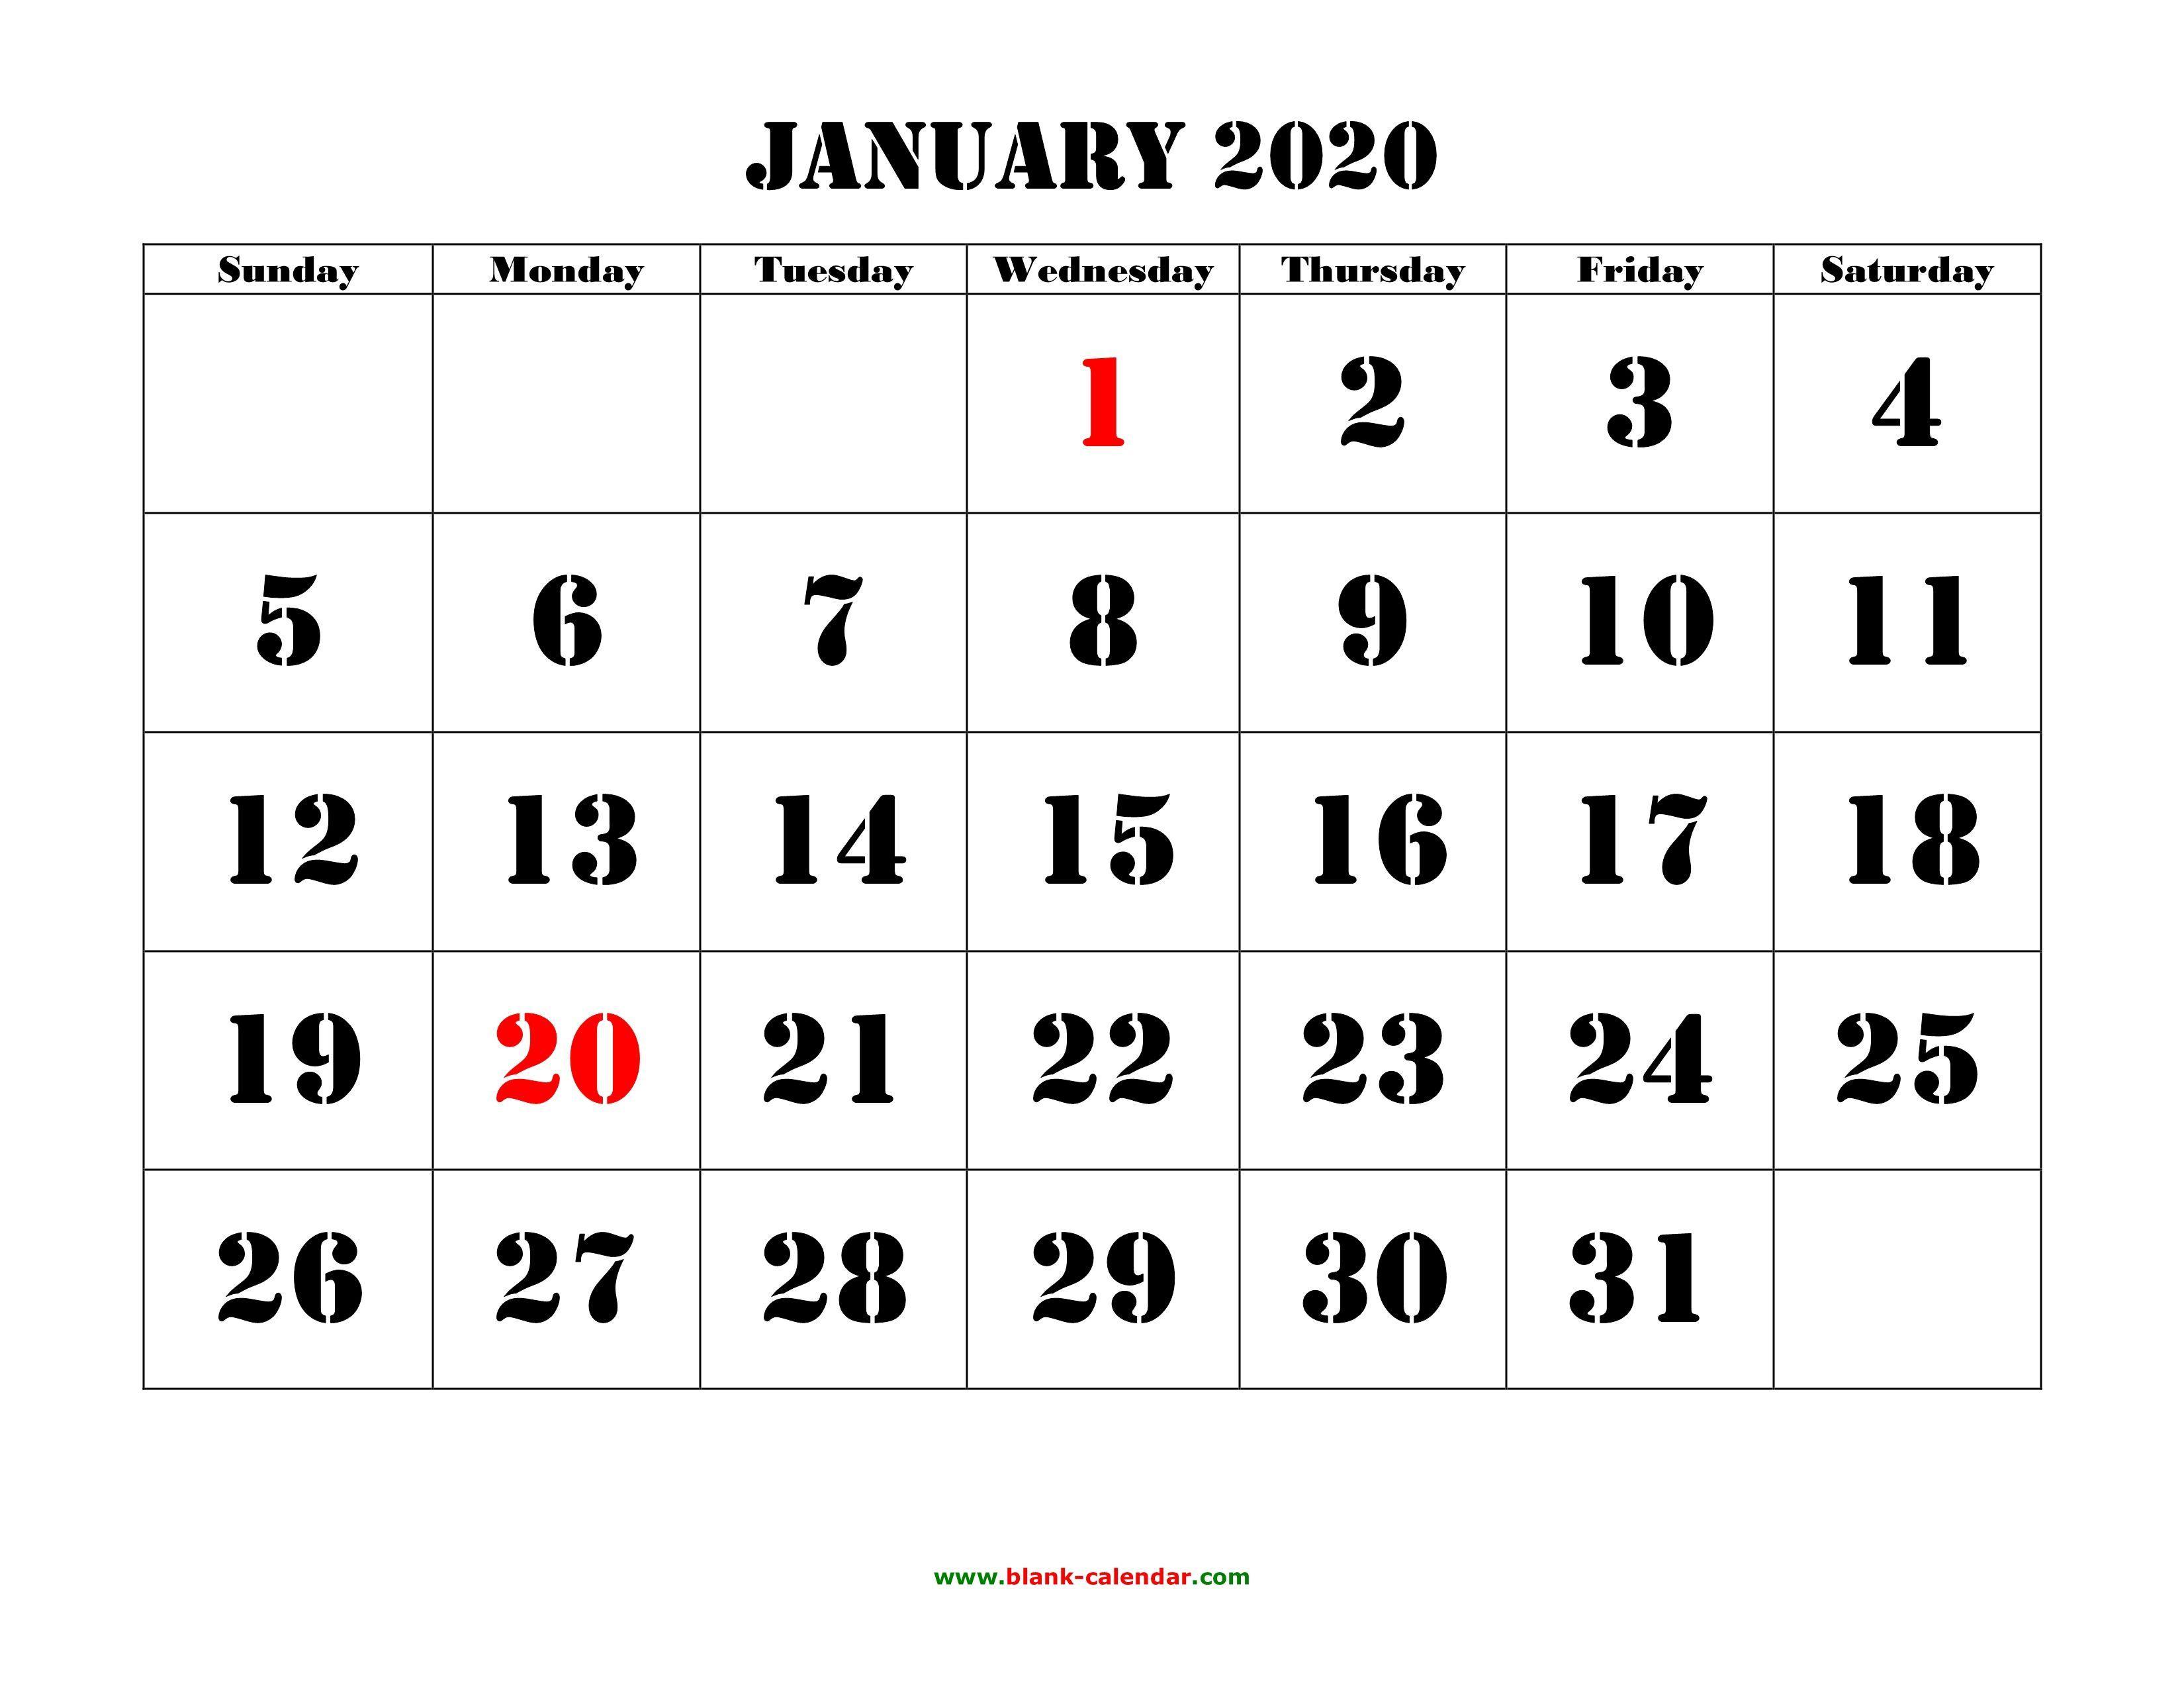 January 2020 Calendar Word 2020 Calendar Wallpapers   Wallpaper Cave